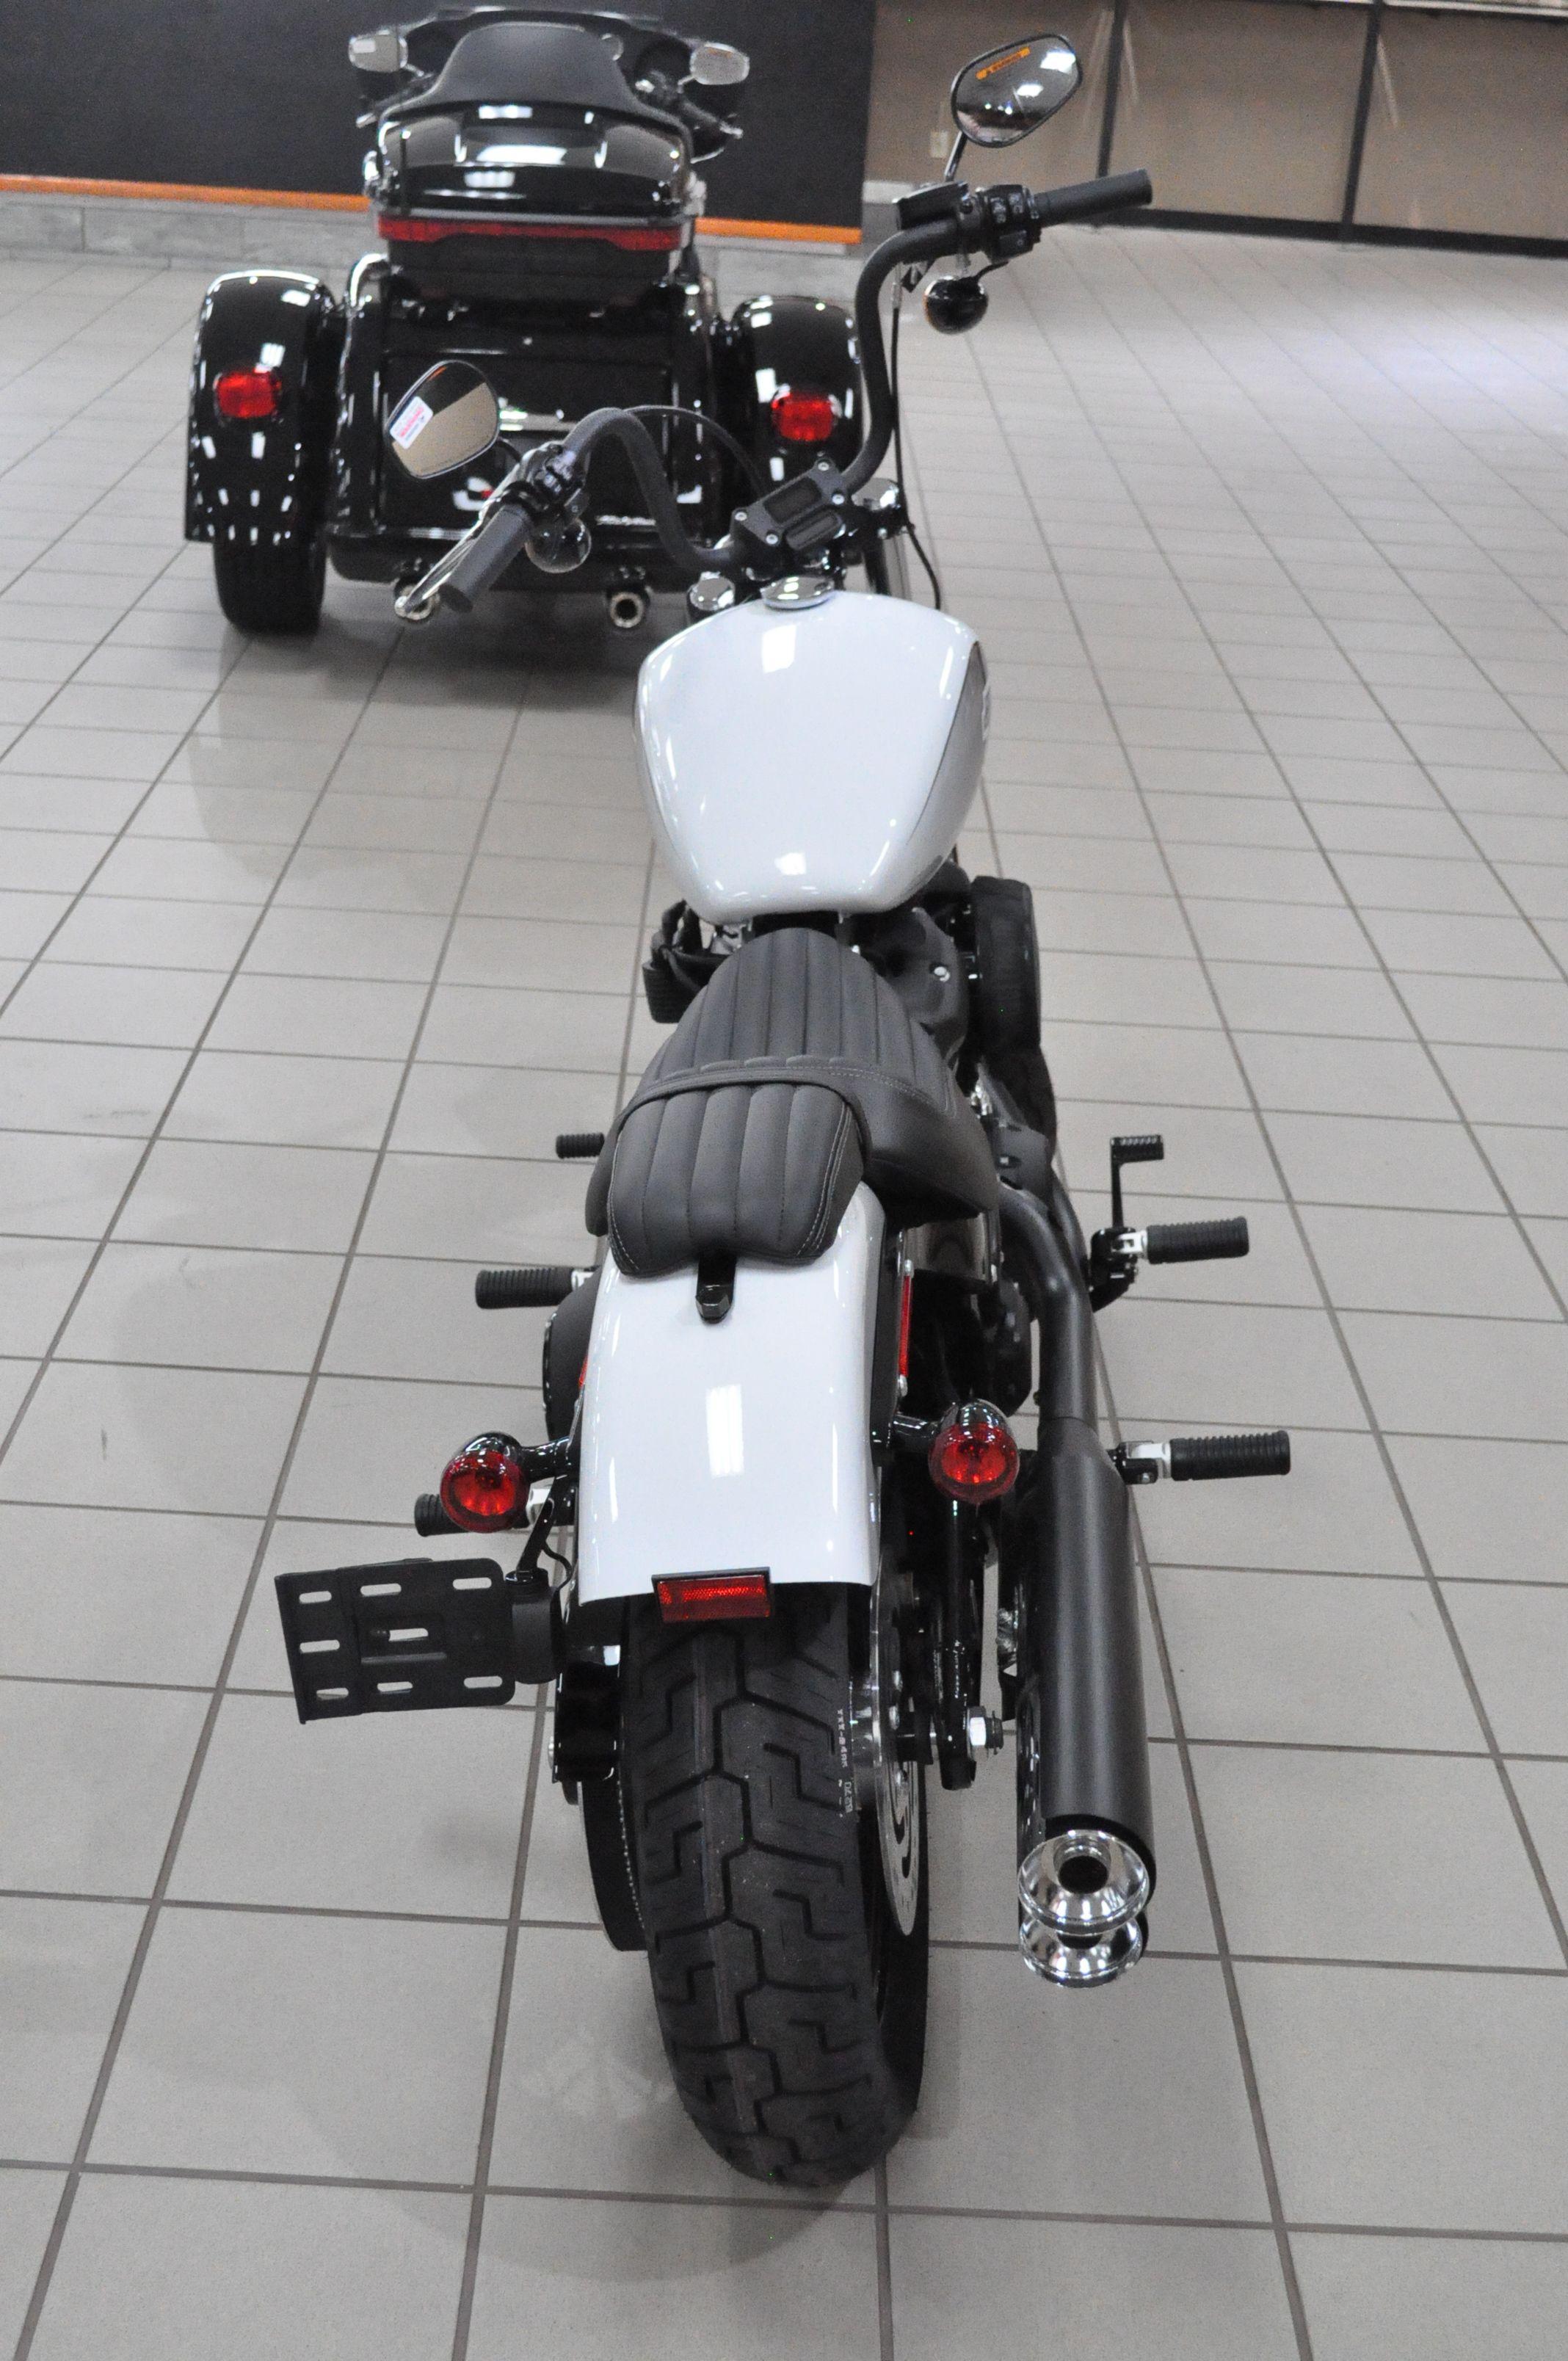 New 2021 Harley-Davidson Street Bob 114 FXBBS